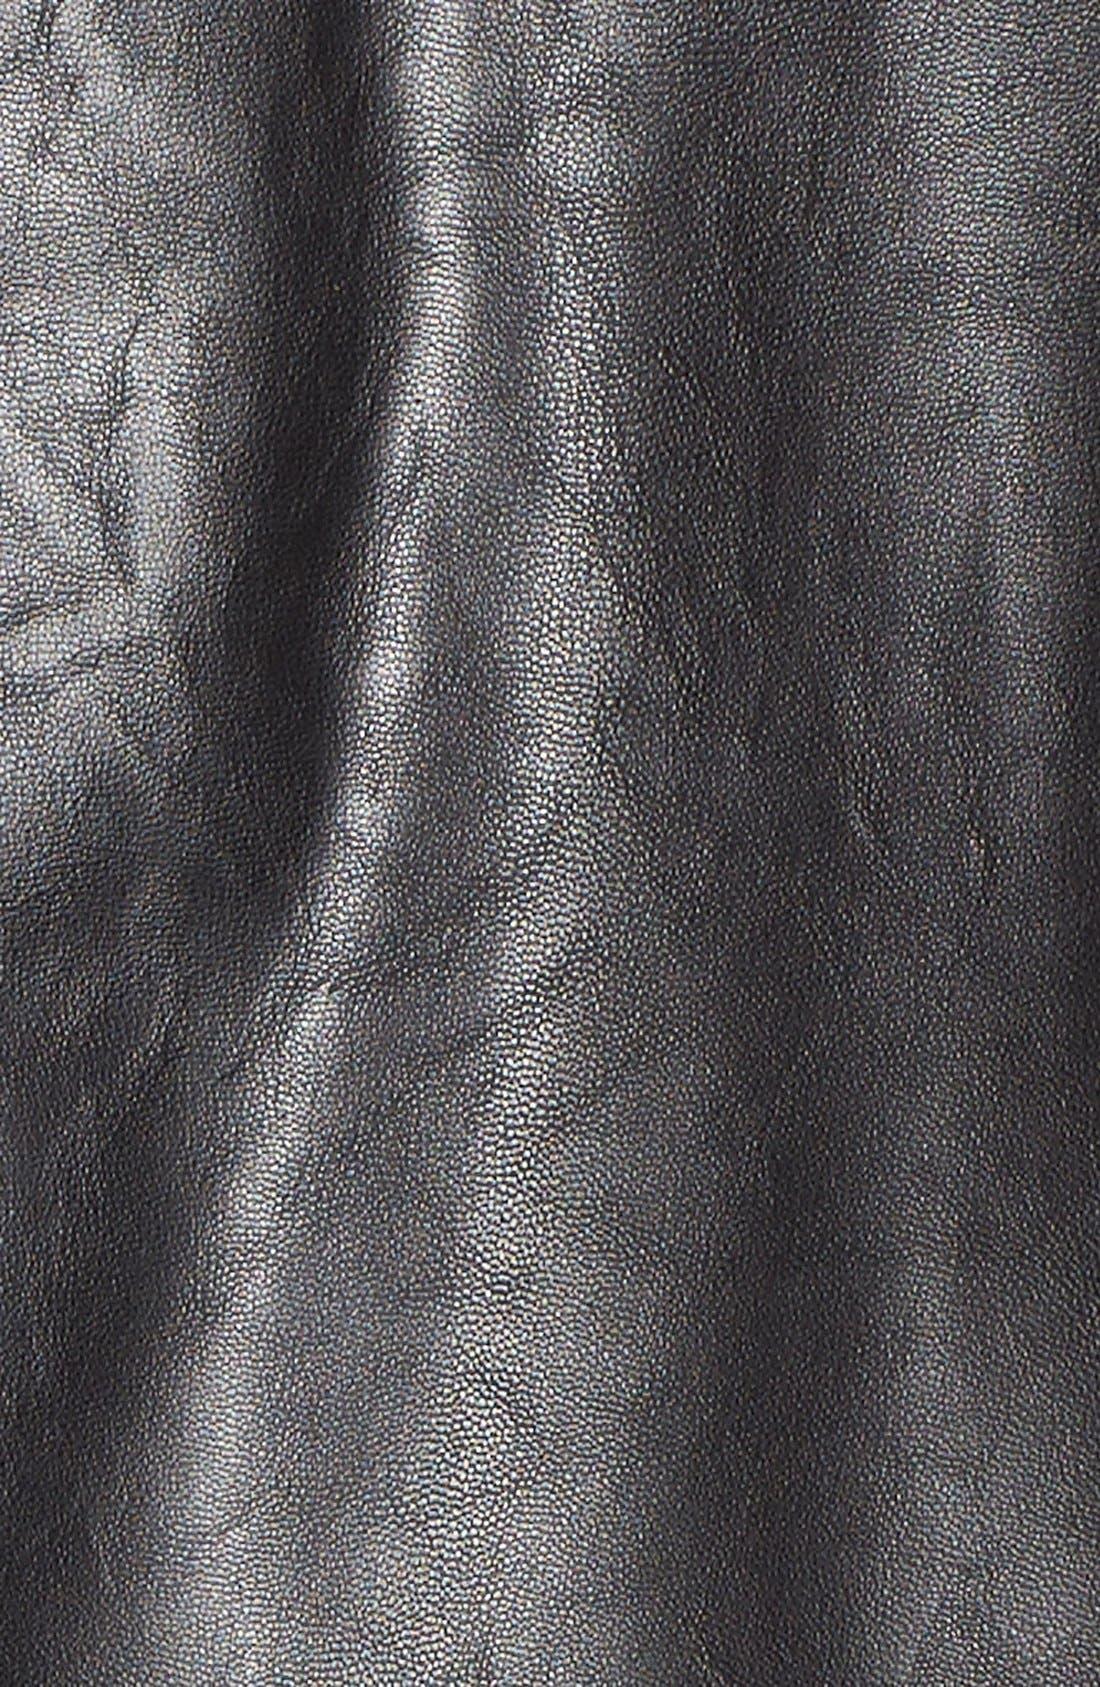 Alternate Image 5  - Levi's® 'Cascade' Faux Leather Jacket (Plus Size)